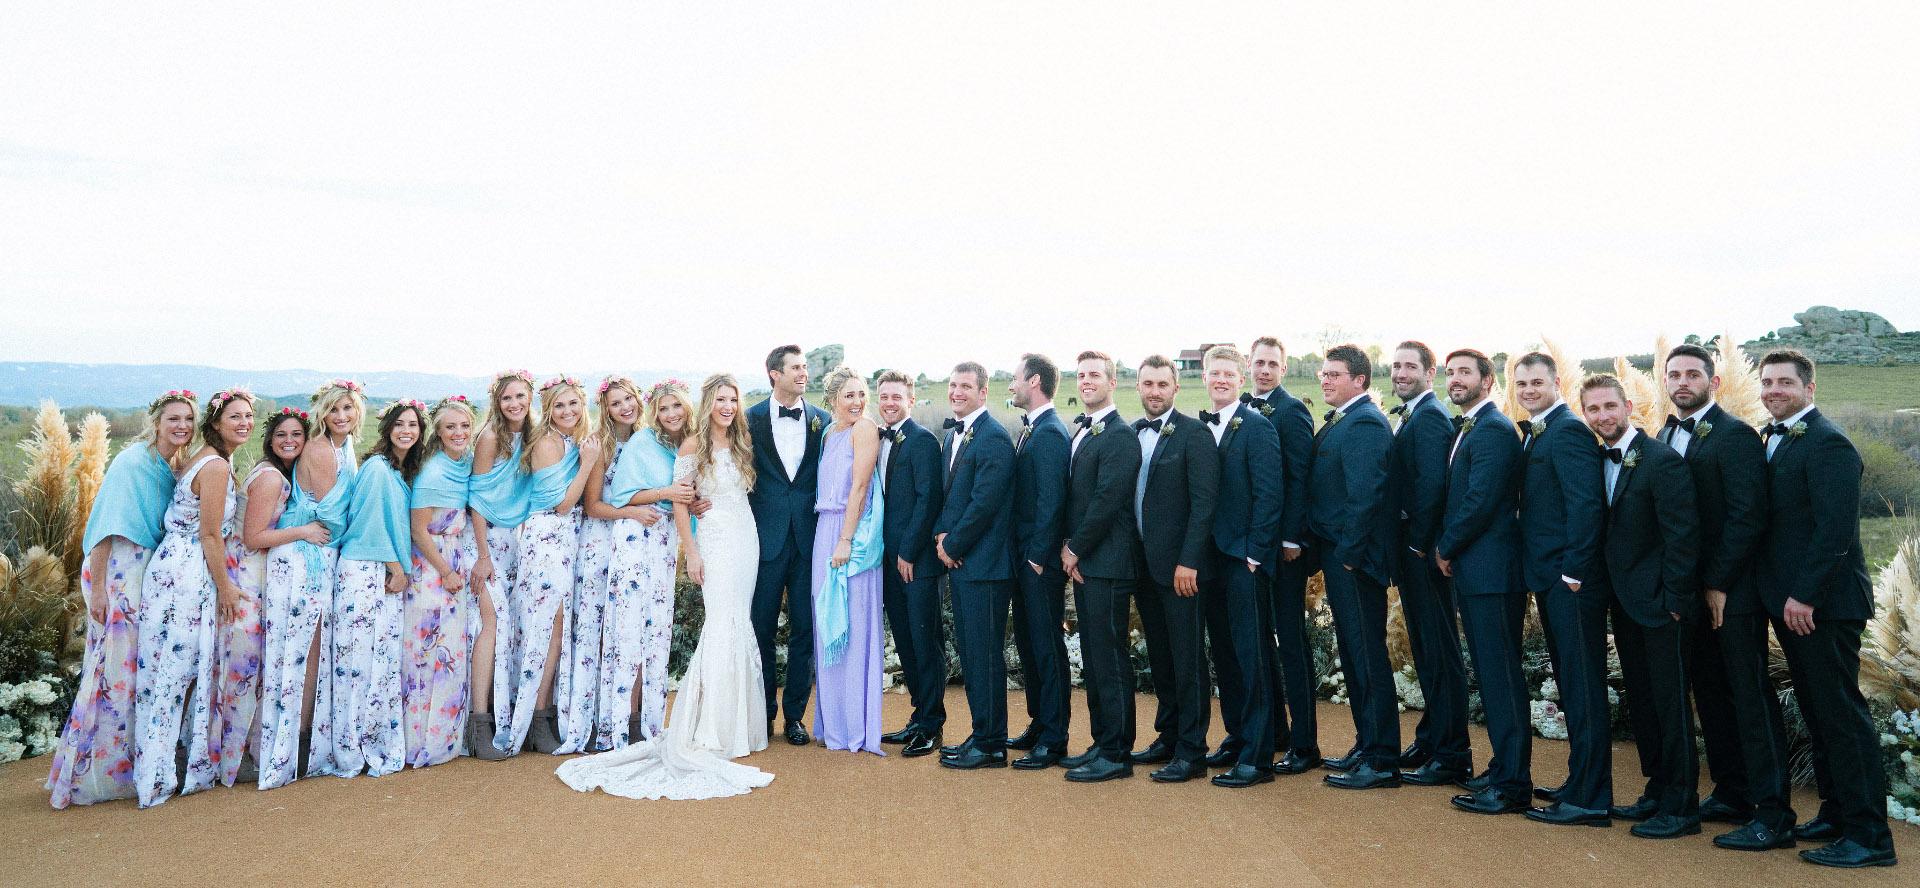 Wedding party group at Brush Creek Ranch